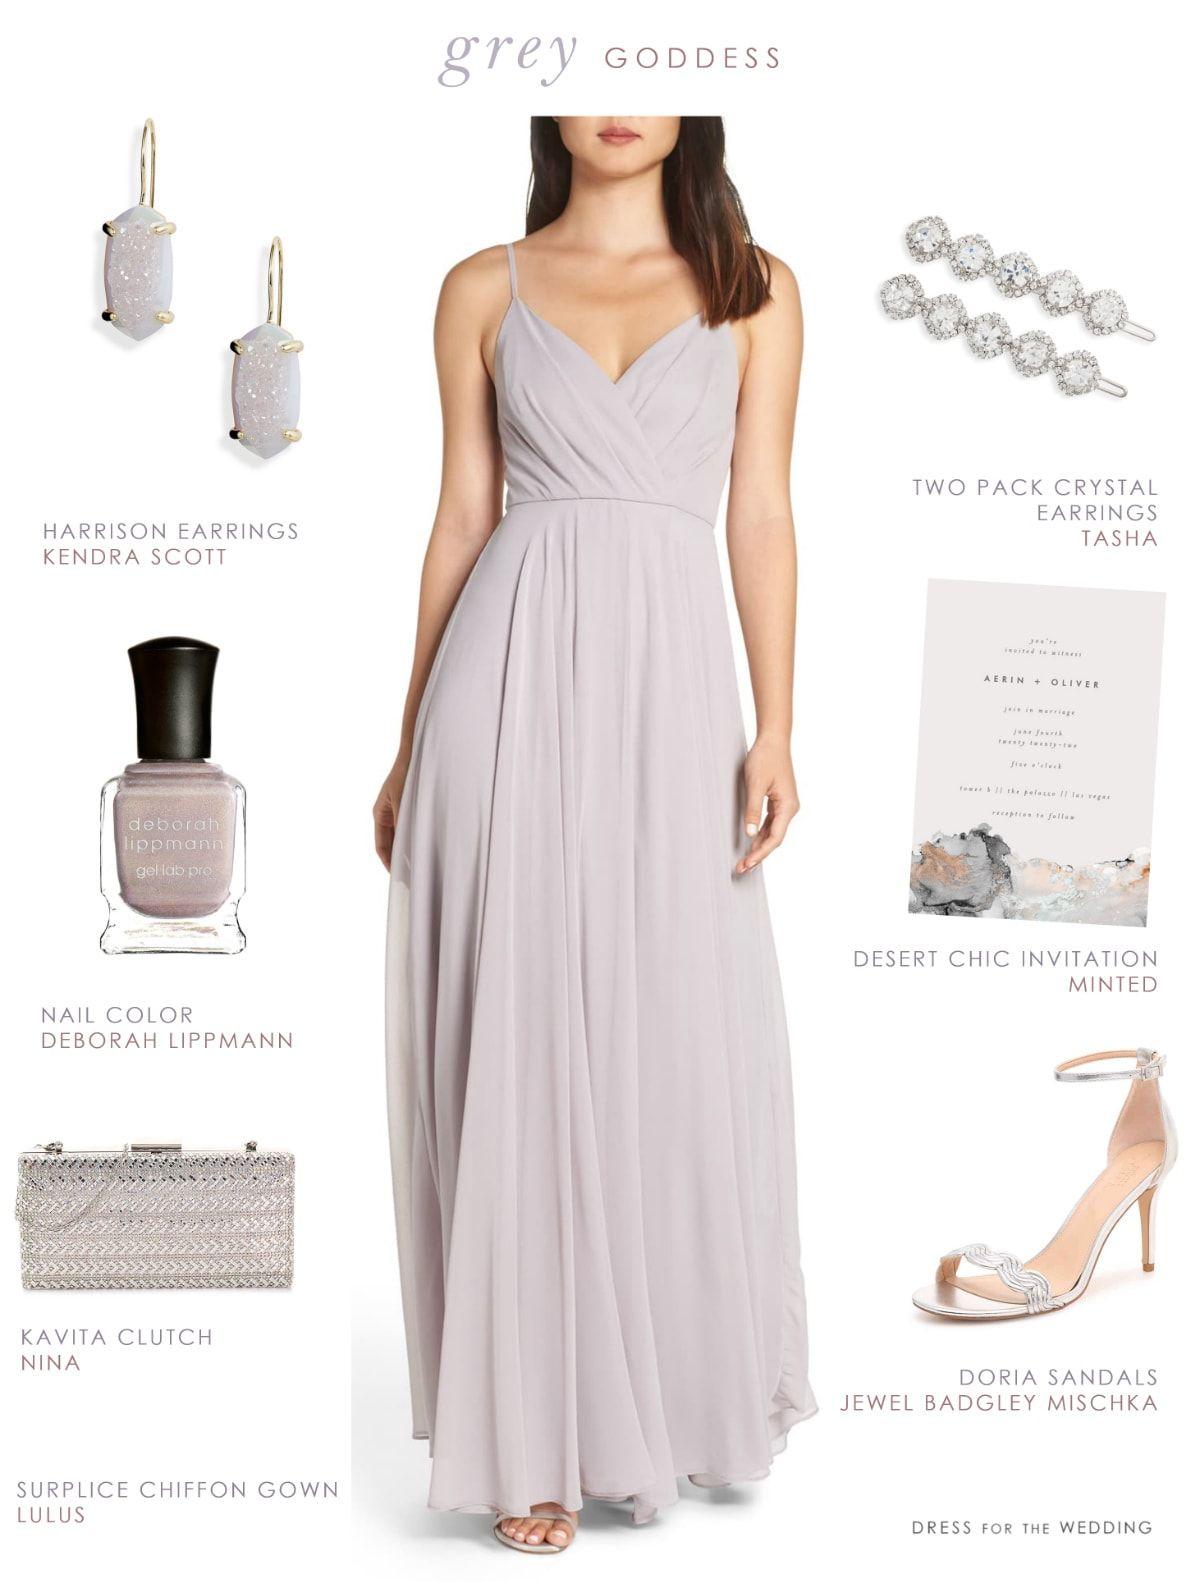 Long Light Grey Chiffon Bridesmaid Dress Dress For The Wedding Grey Bridesmaid Dresses Light Grey Bridesmaid Dresses Gray Chiffon Bridesmaid Dress